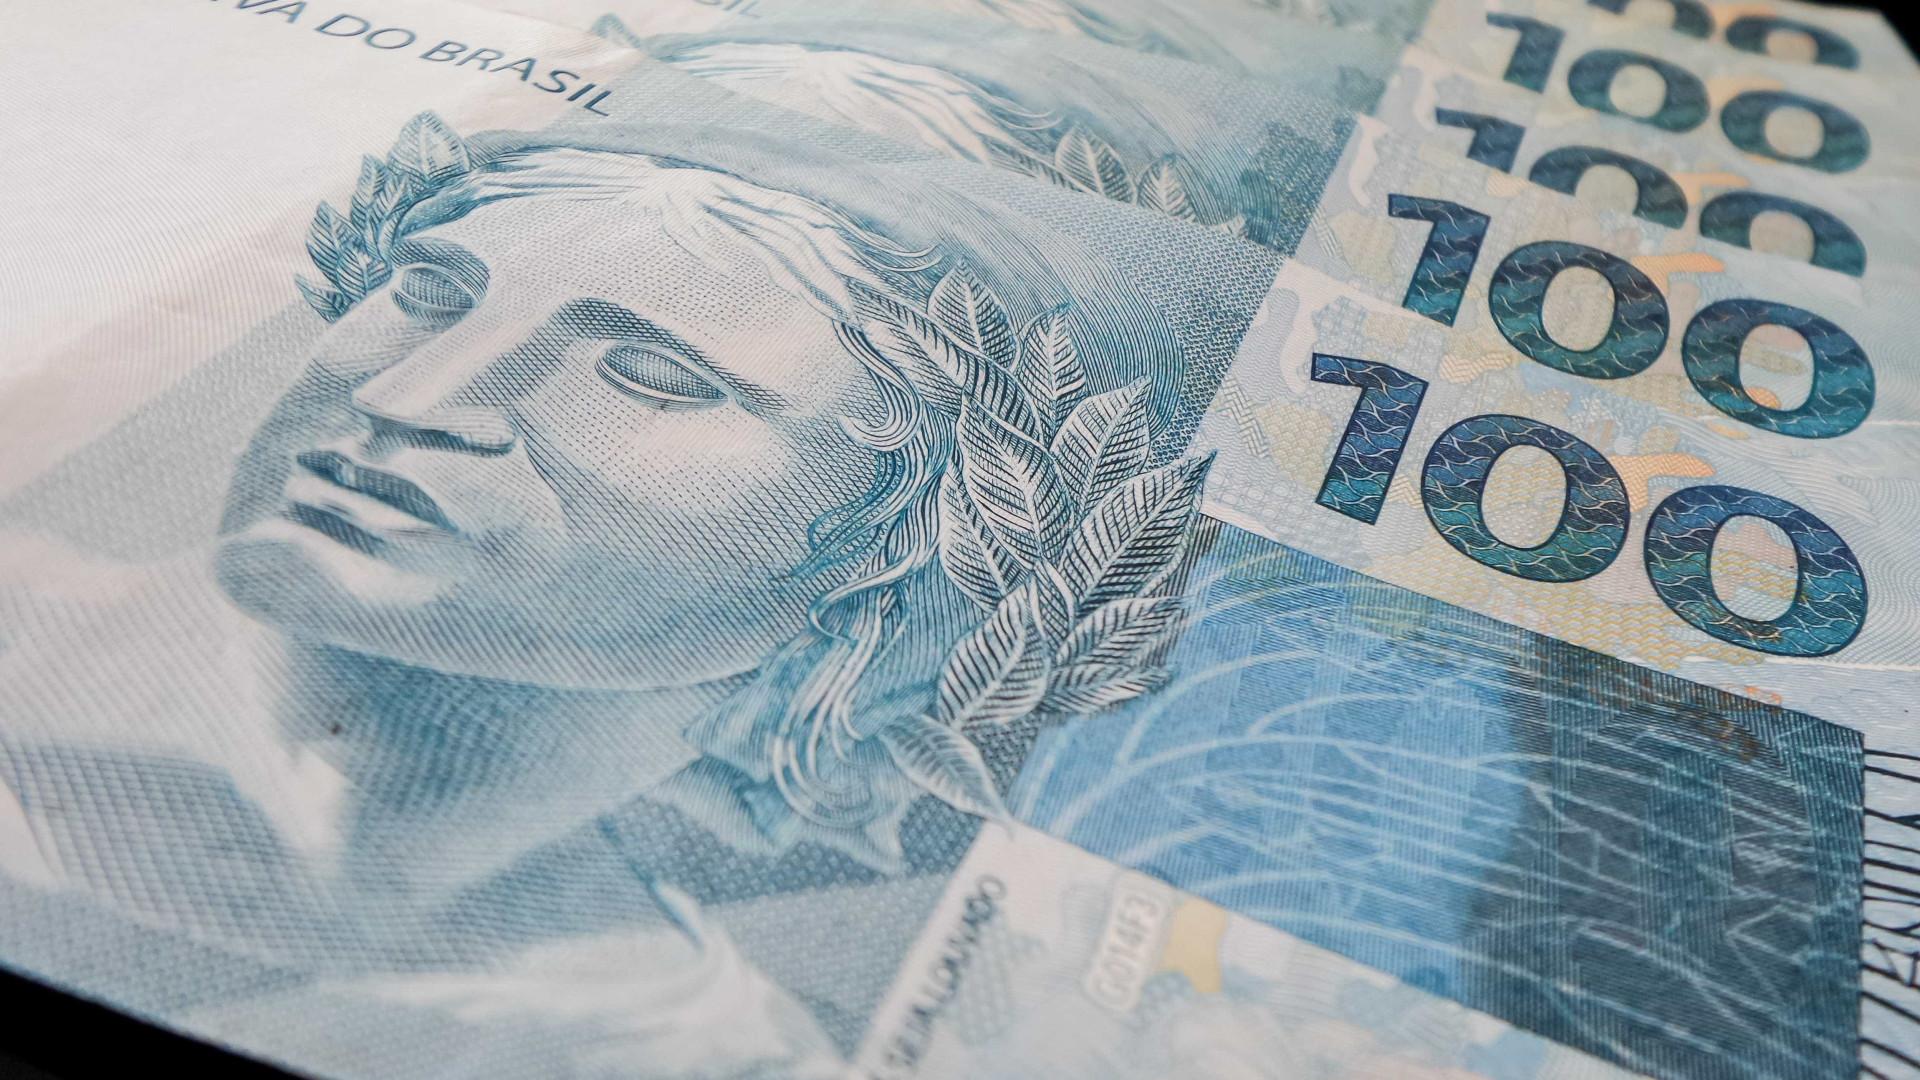 Investidor negocia títulos públicos na euforia eleitoral